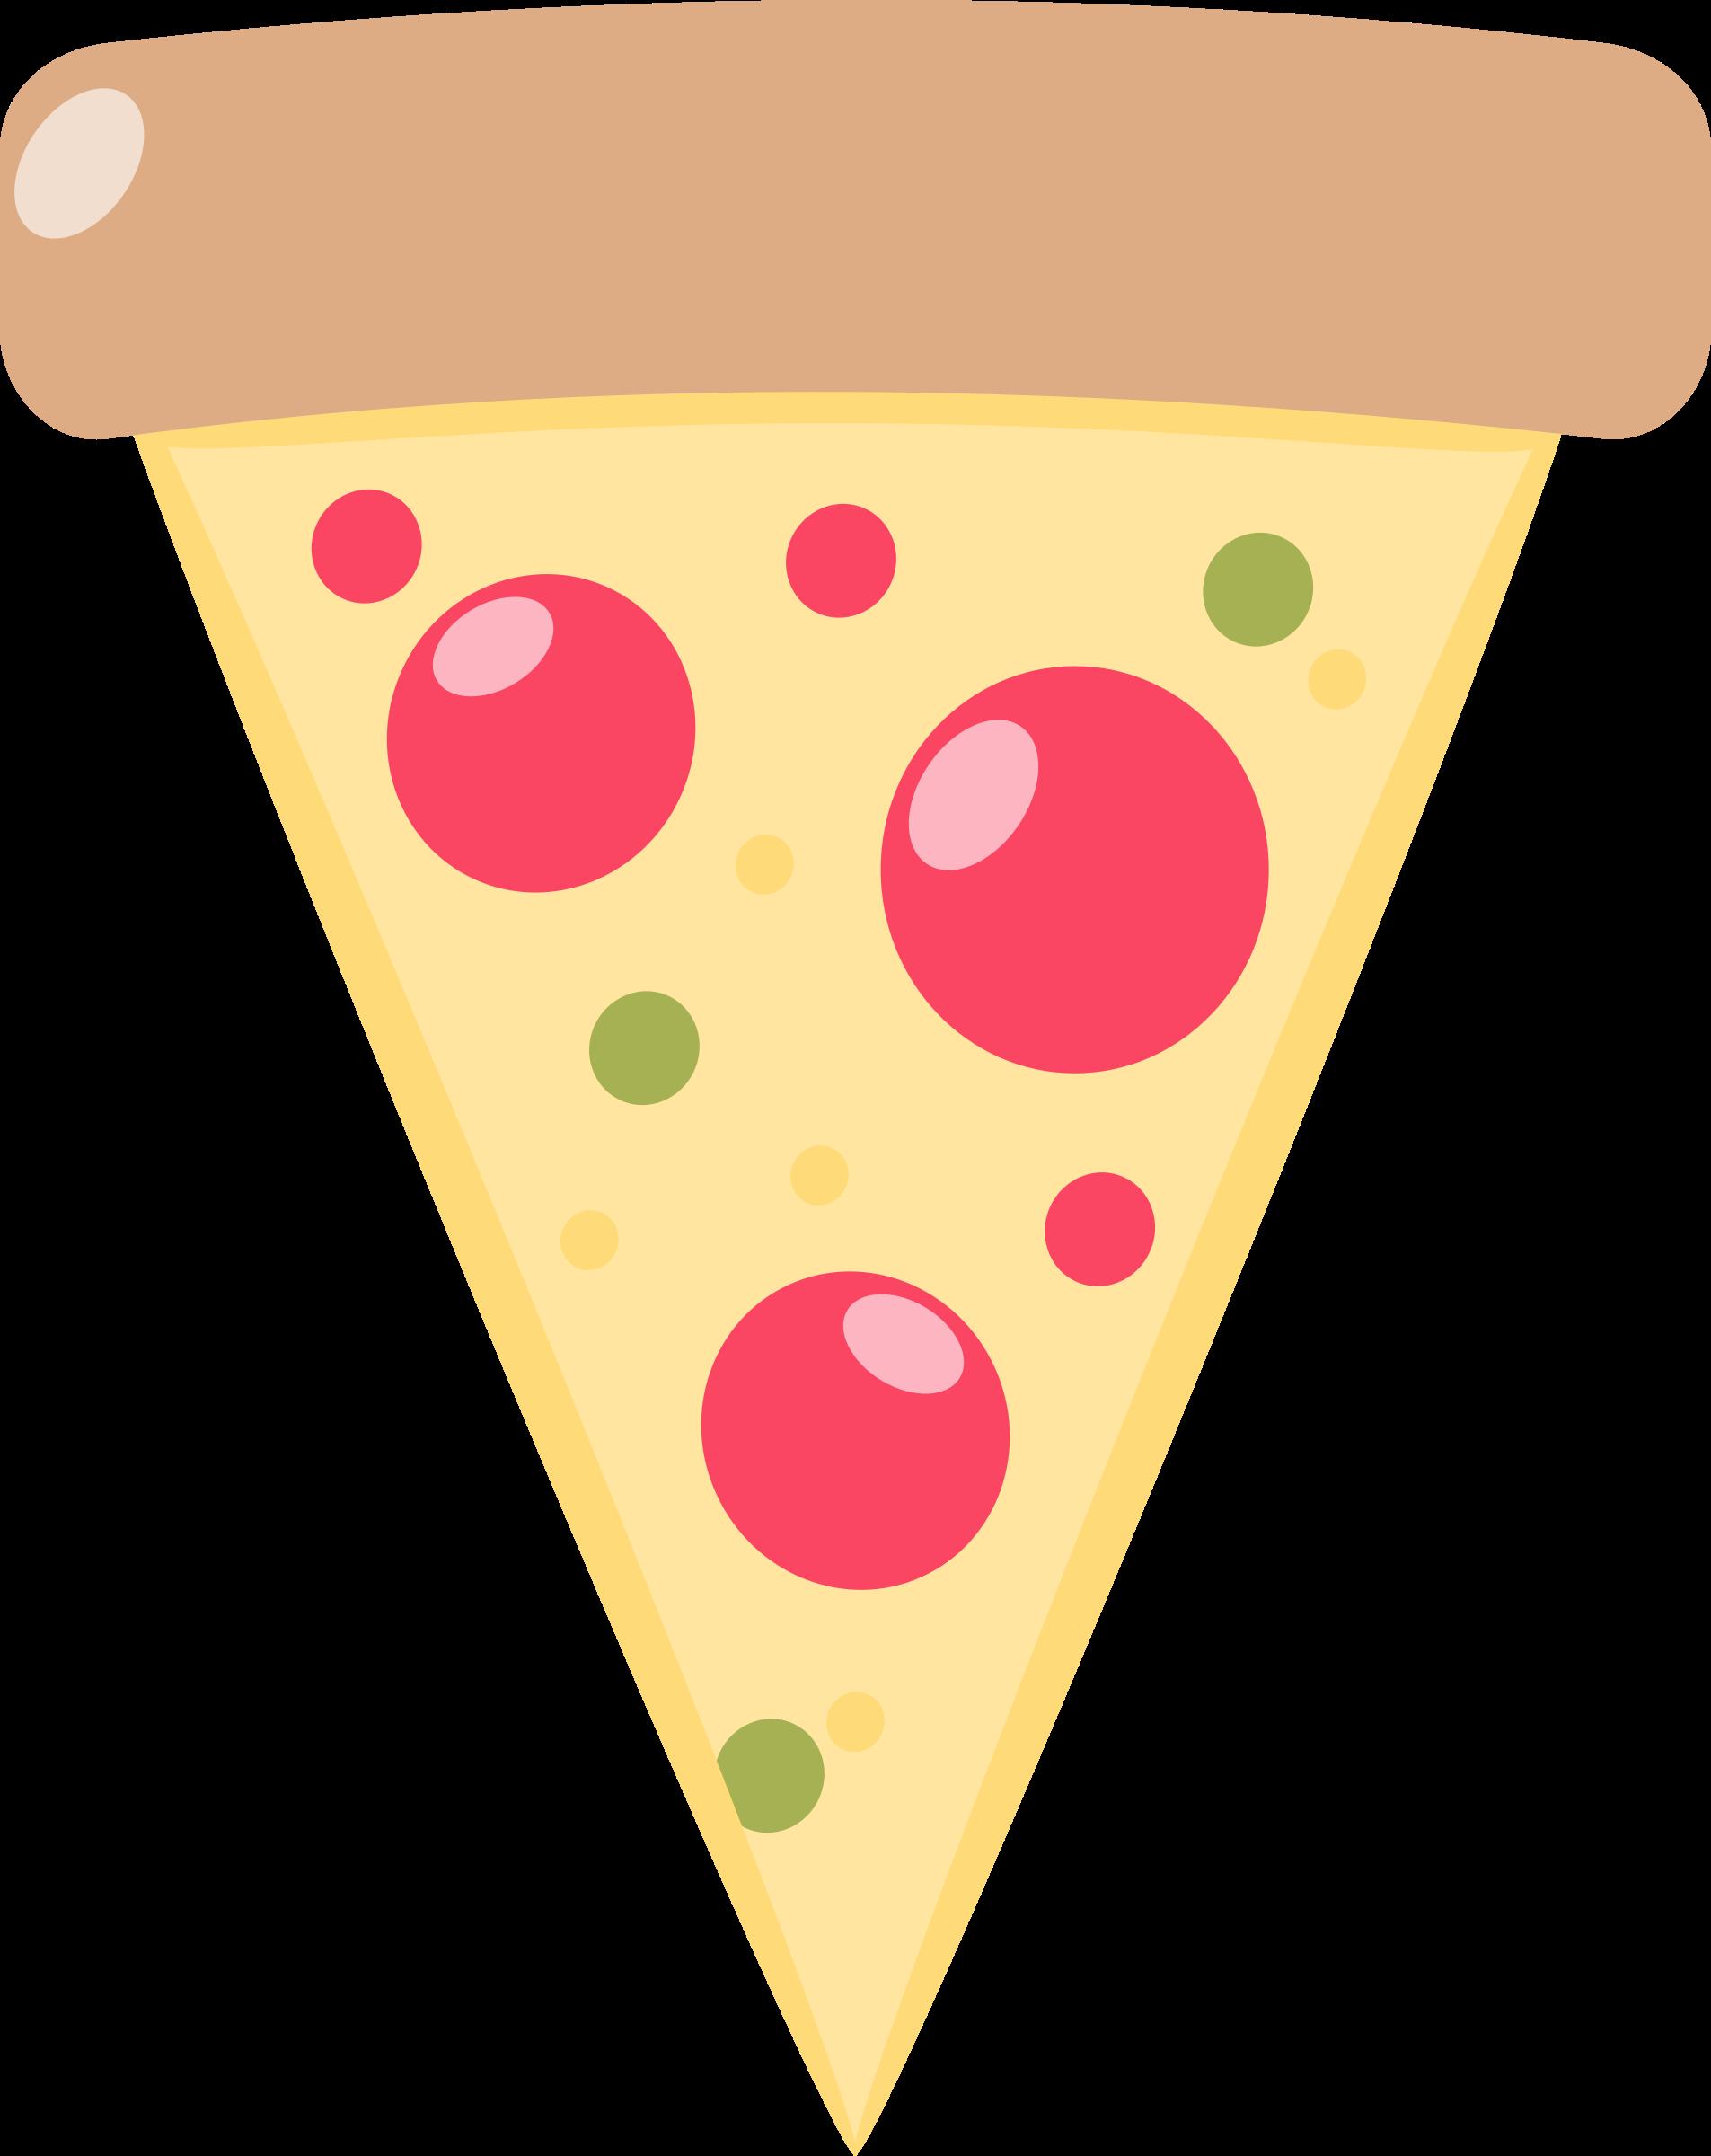 clipart pizza slice rh openclipart org pizza slice clipart no background pizza slice clipart png